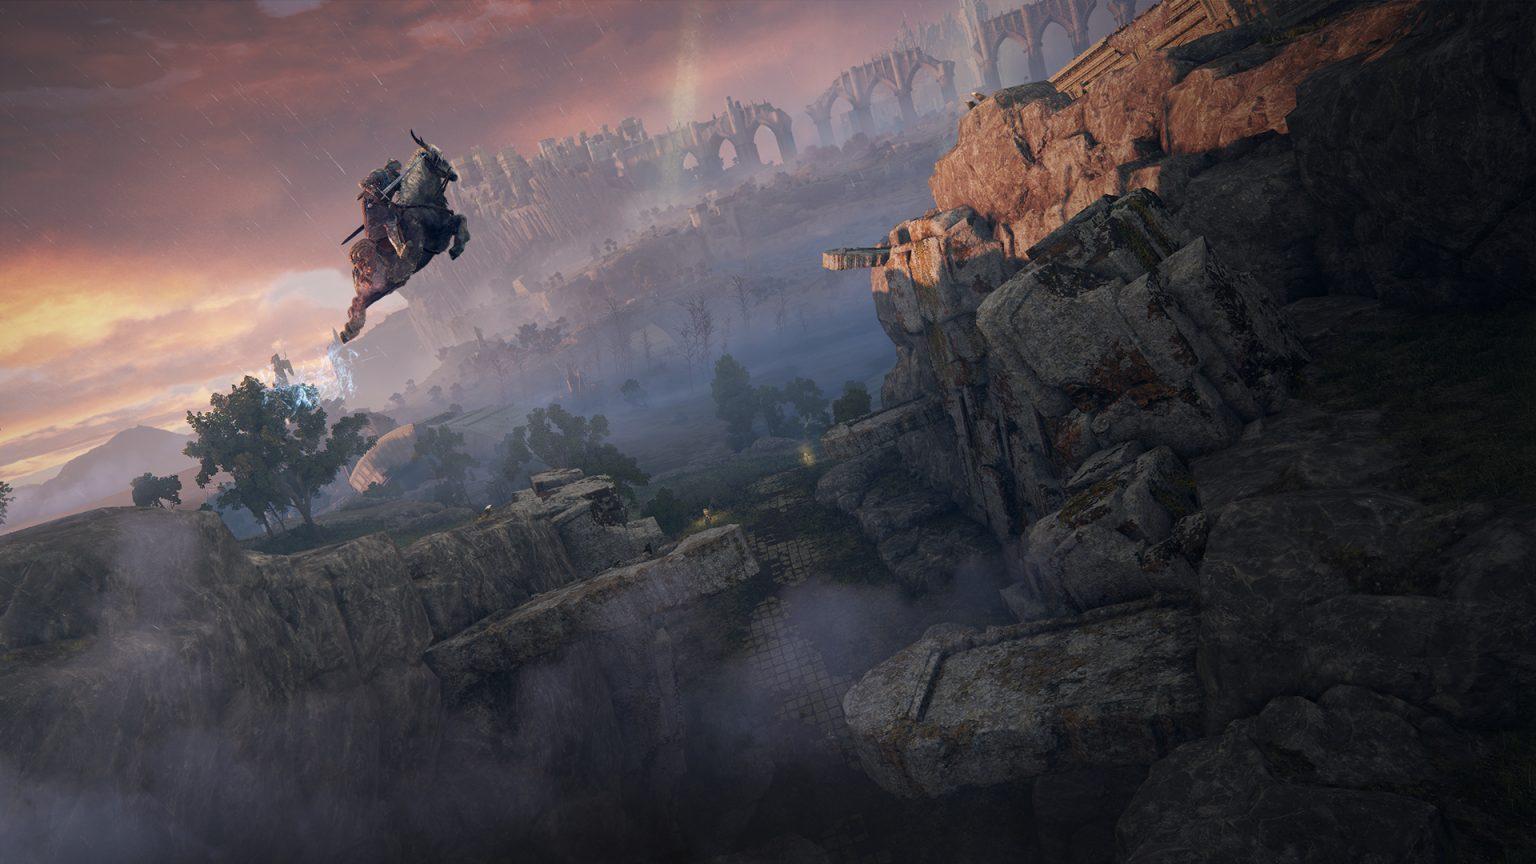 E3 2021   جزئیات بیشتری از بازی Elden Ring منتشر شد